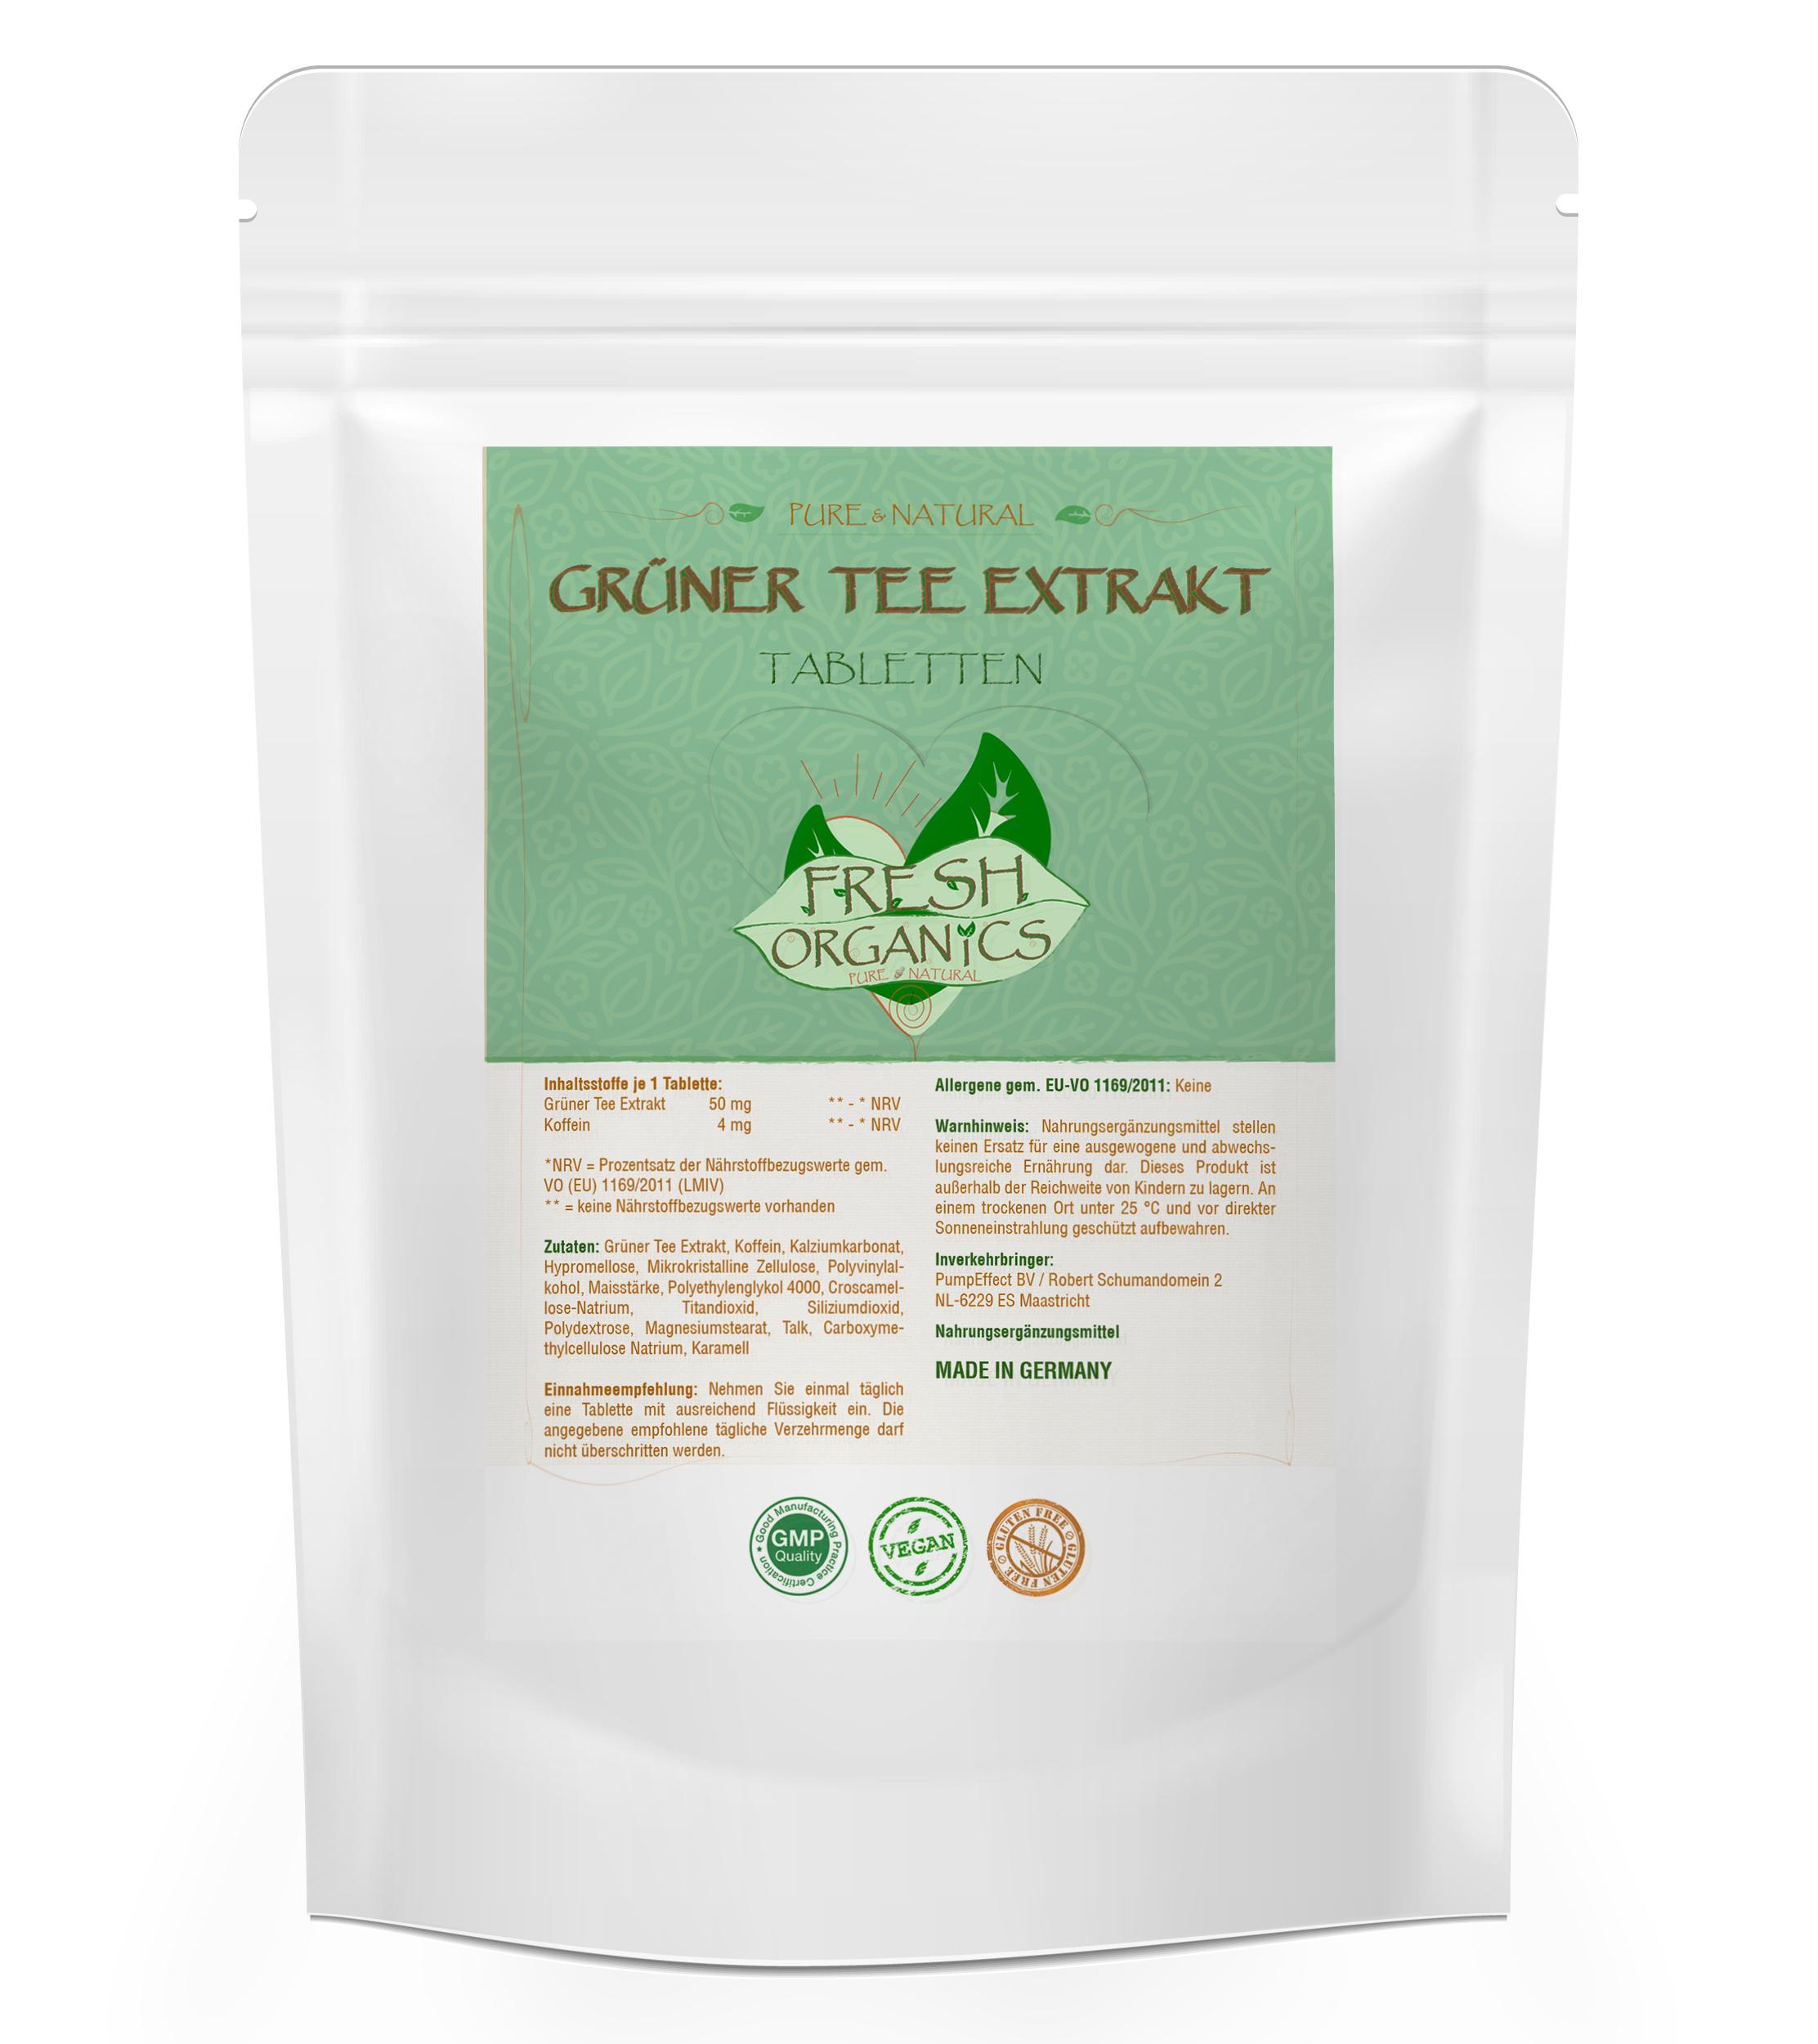 Green Tea Extract | Grüner Tee Extrakt  500 Tabletten